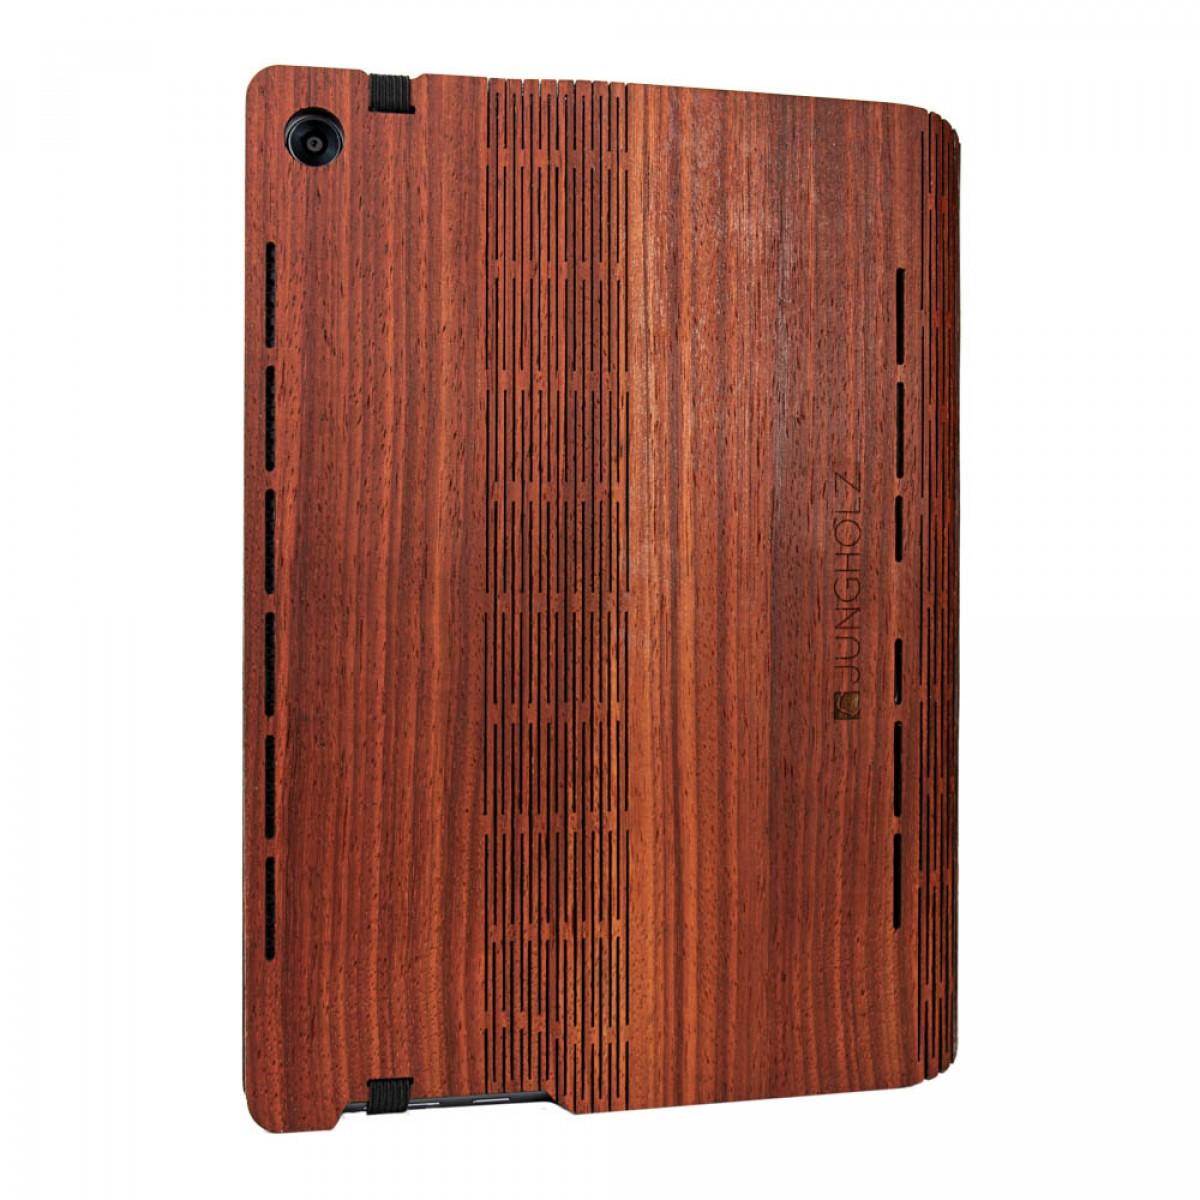 JUNGHOLZ Design WoodCase, Tablet, Padouk, Huawei MediaPad M5 Pro 10.8''